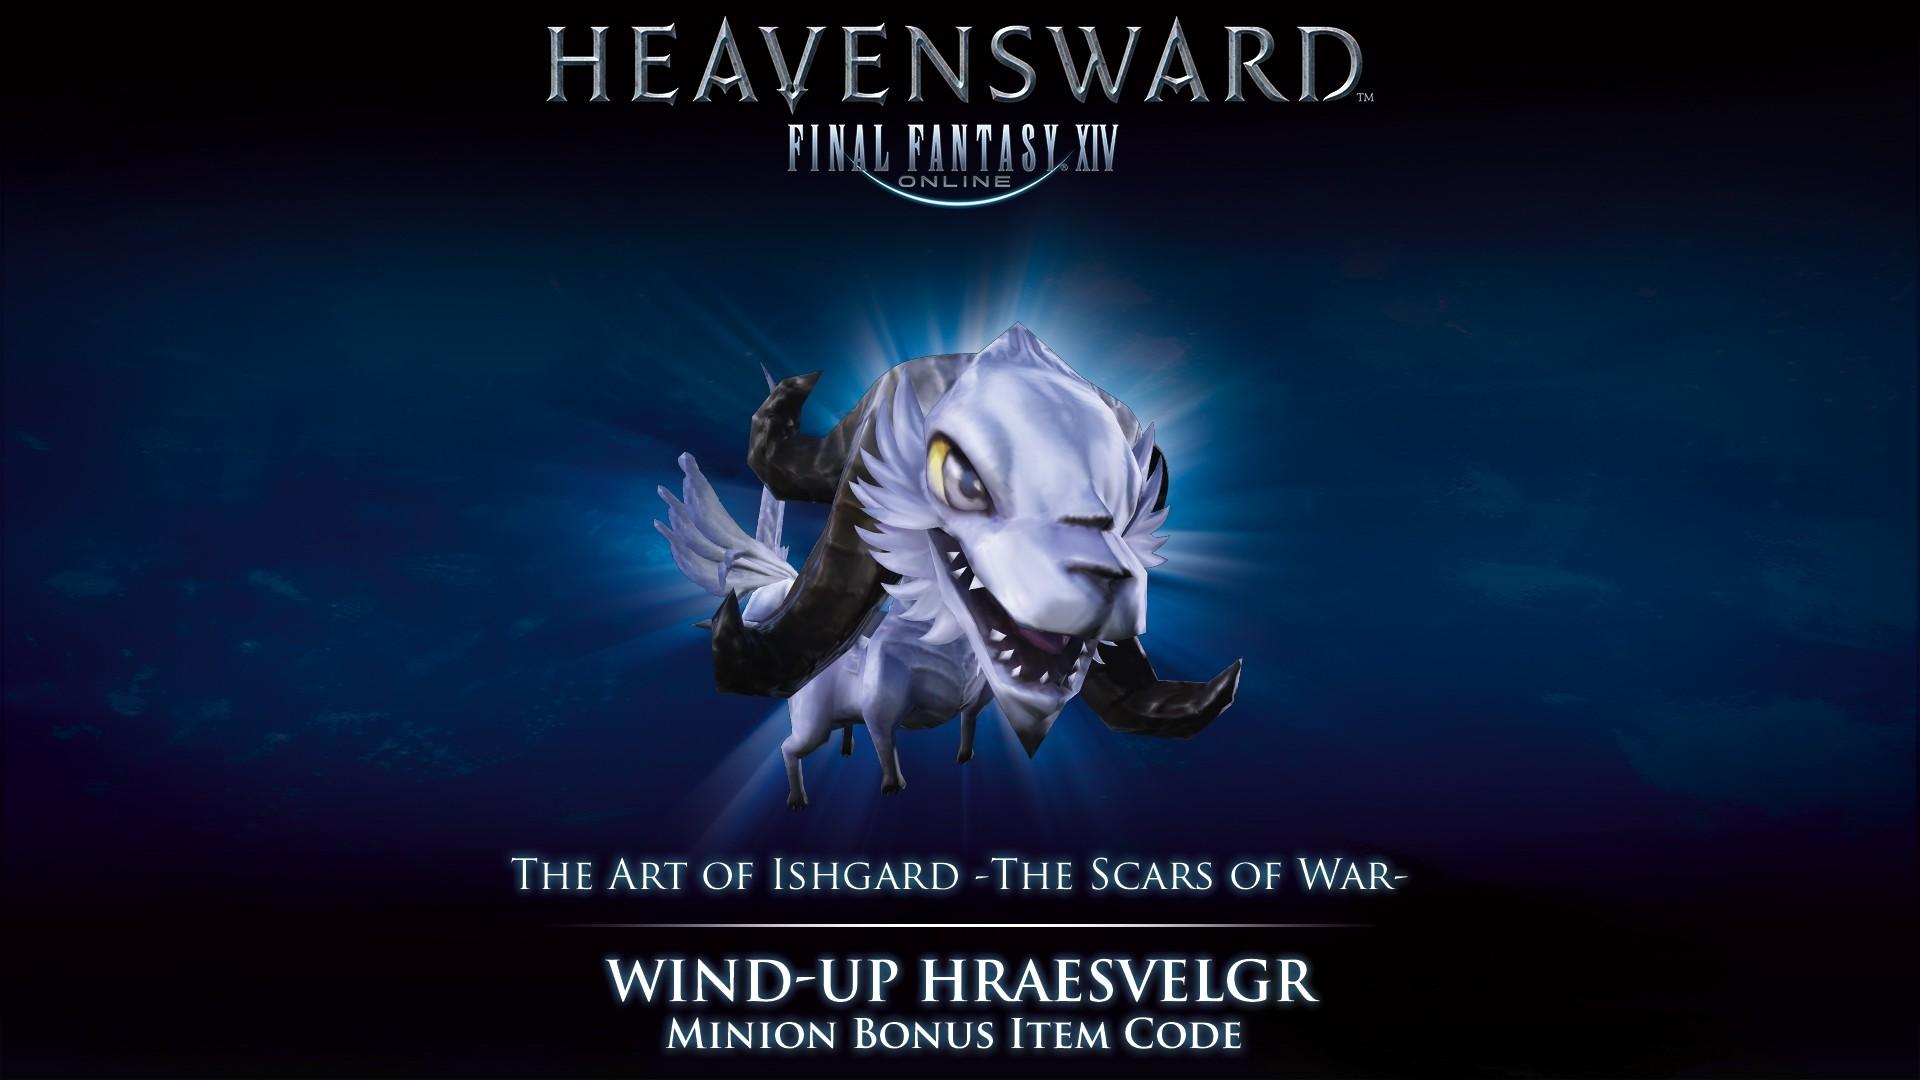 ffxiv heavensward wallpaper 95 images